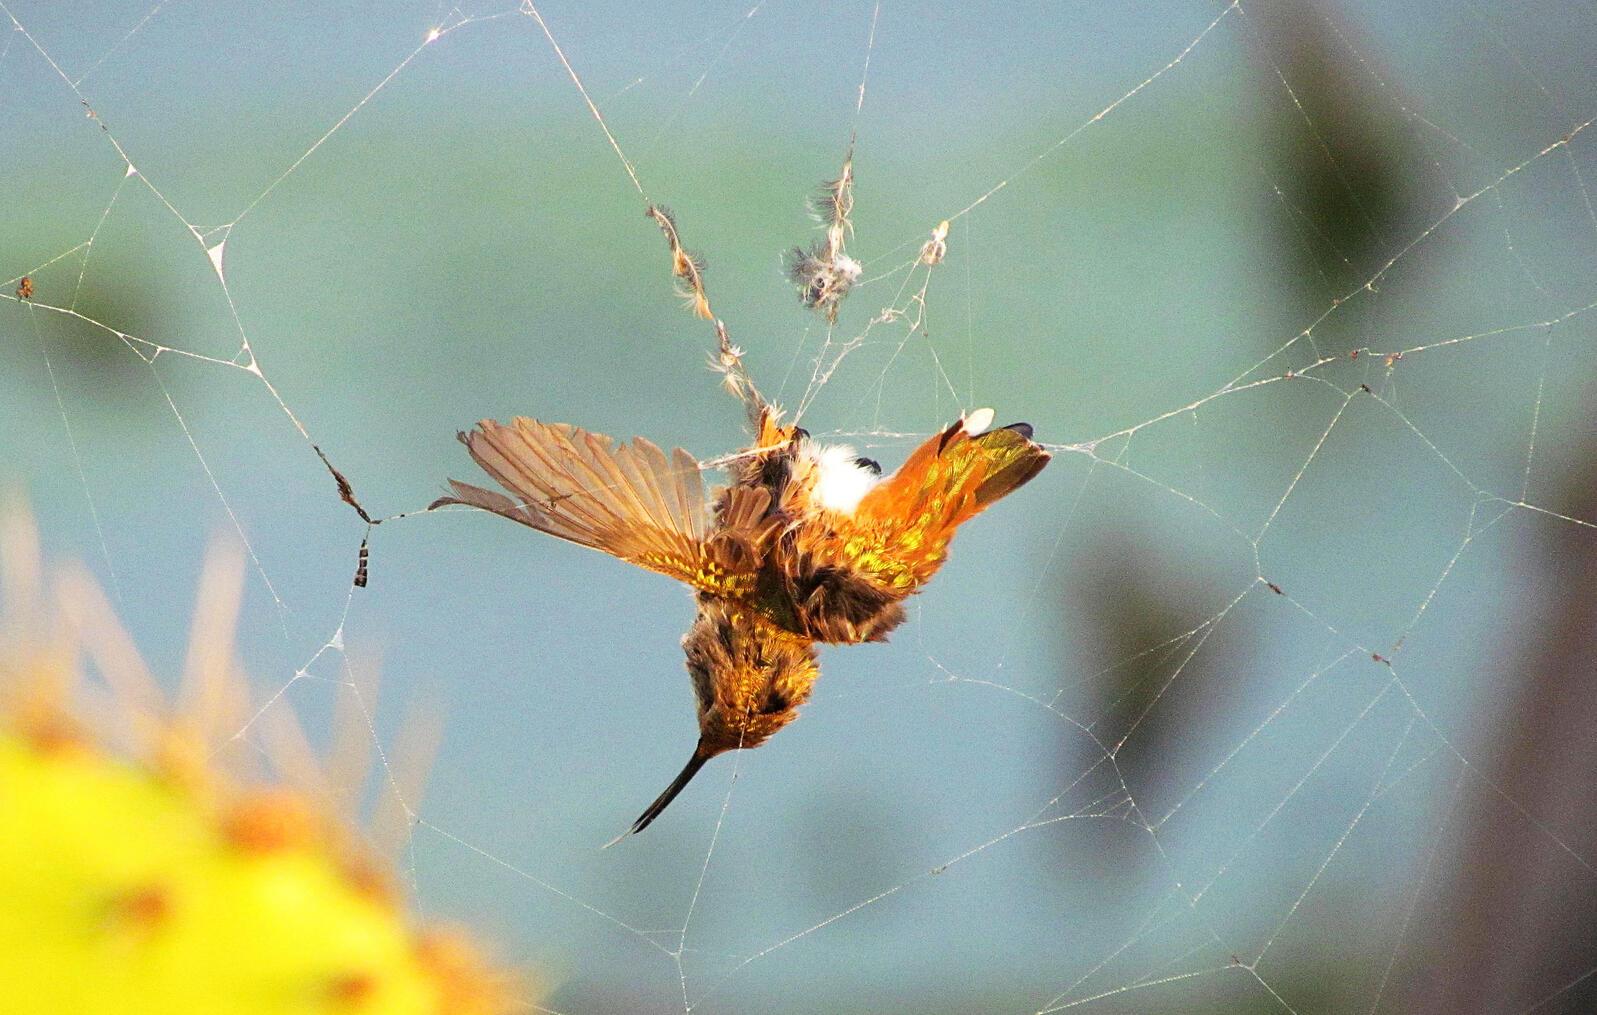 Spider webs can sometimes serve as hummingbird traps, too. Jane Elizabeth Lazarz